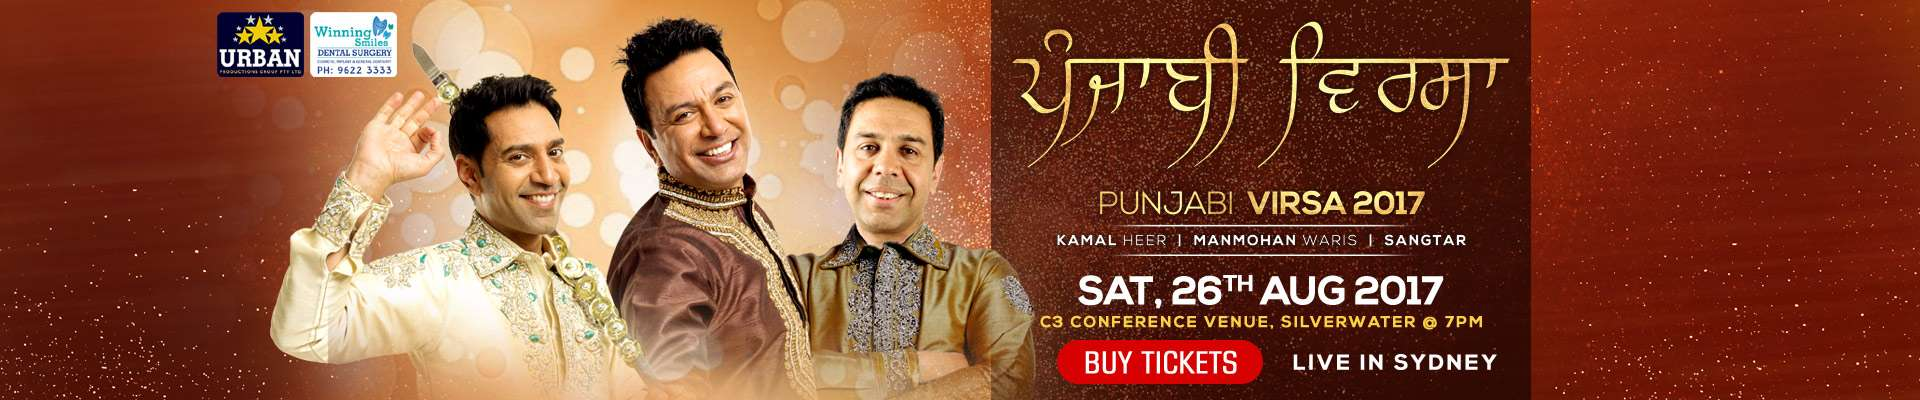 Punjabi Virsa 2017 Live In Sydney